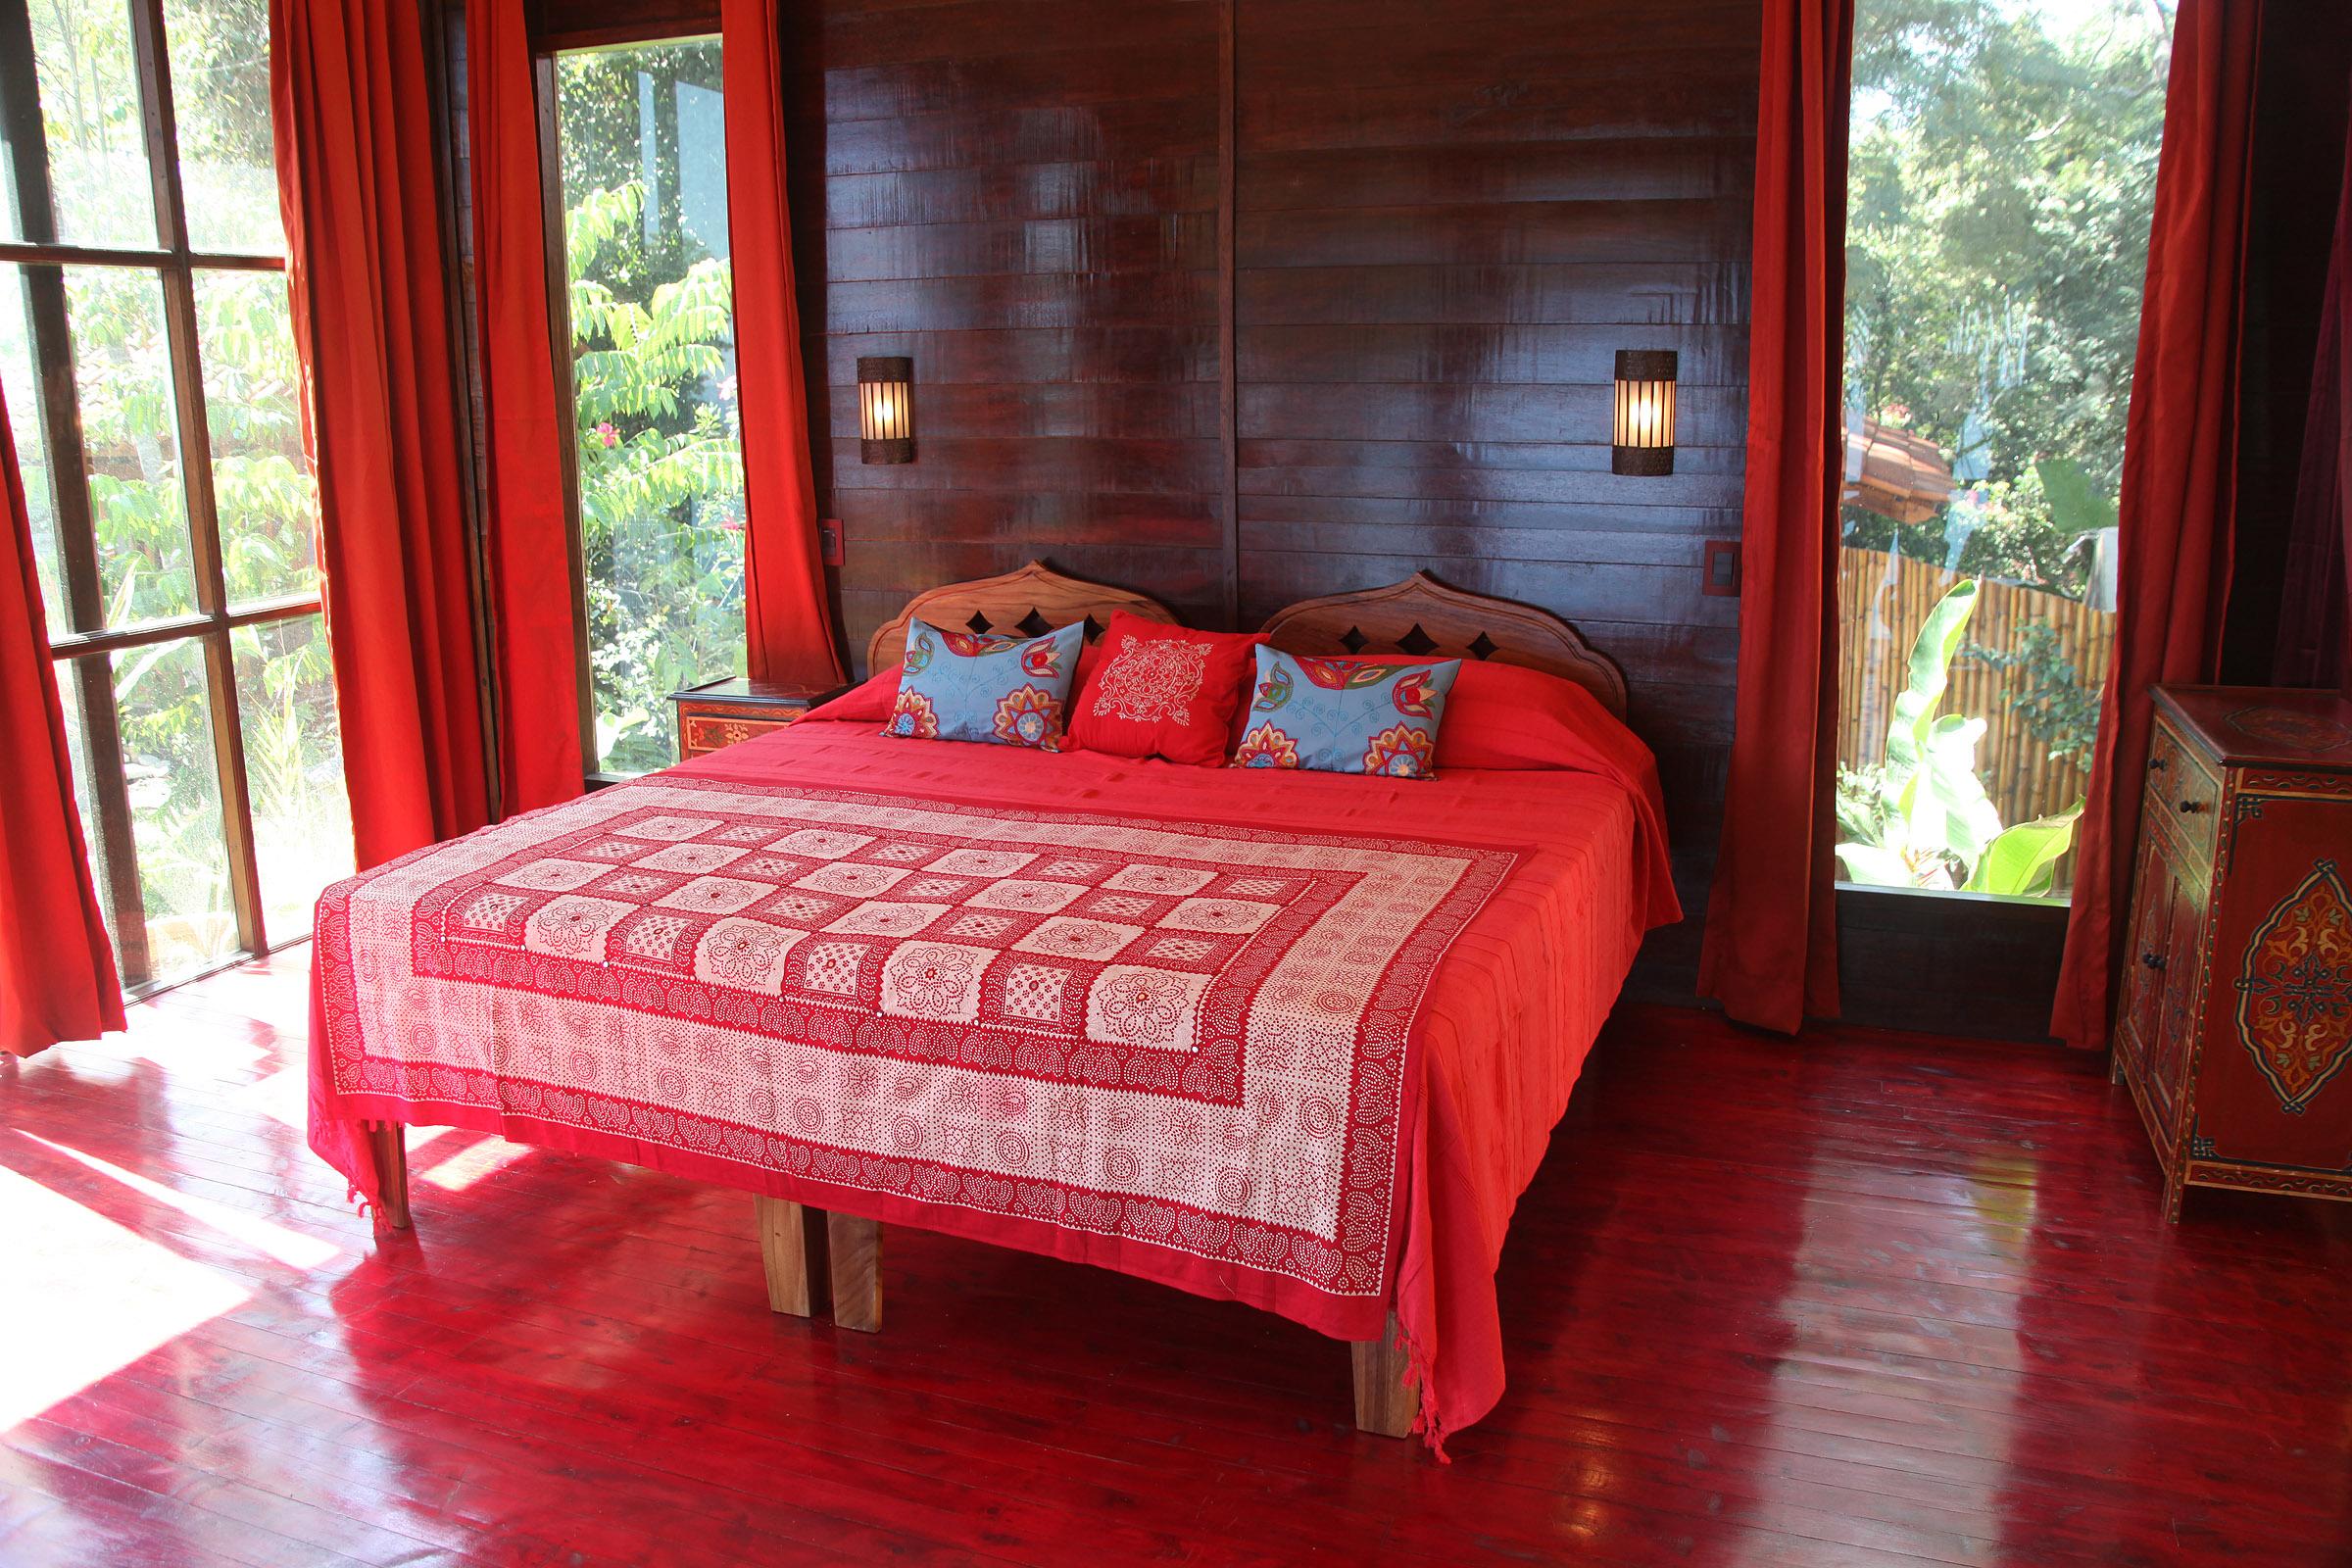 Bali Cabina, Anamaya Resort, Costa Rica